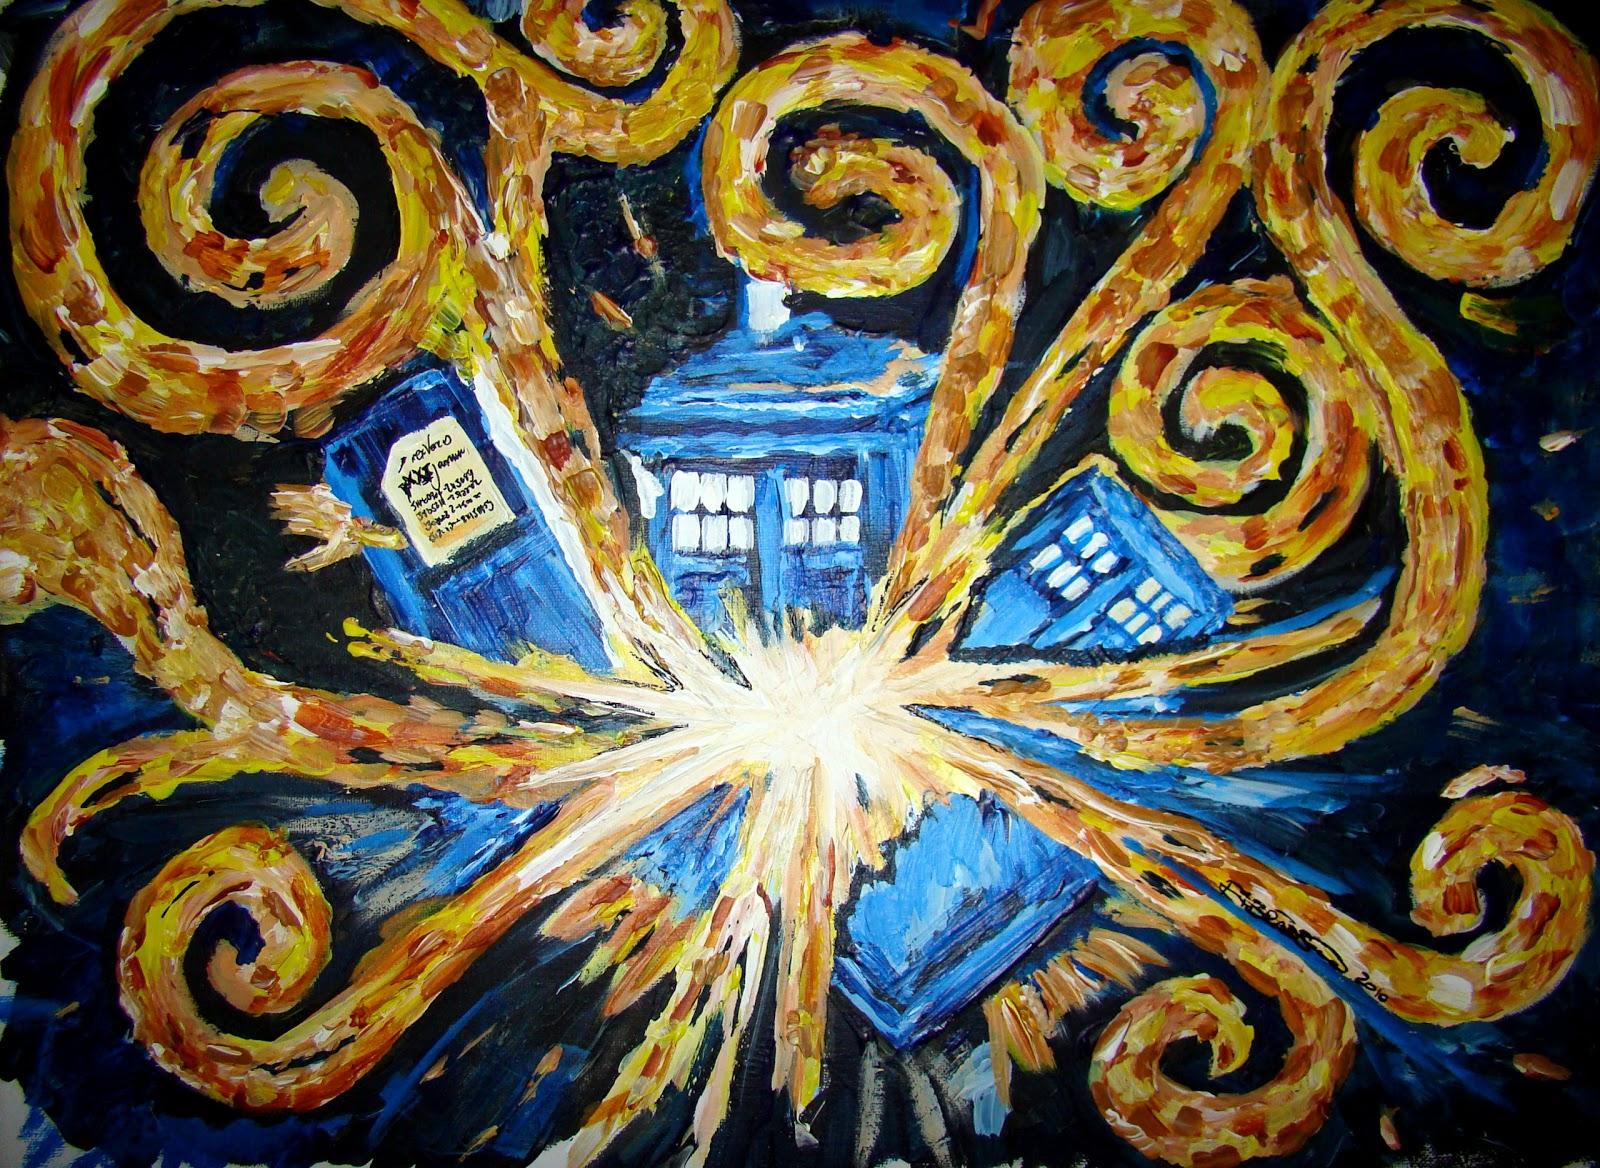 tardis art exploding - photo #18